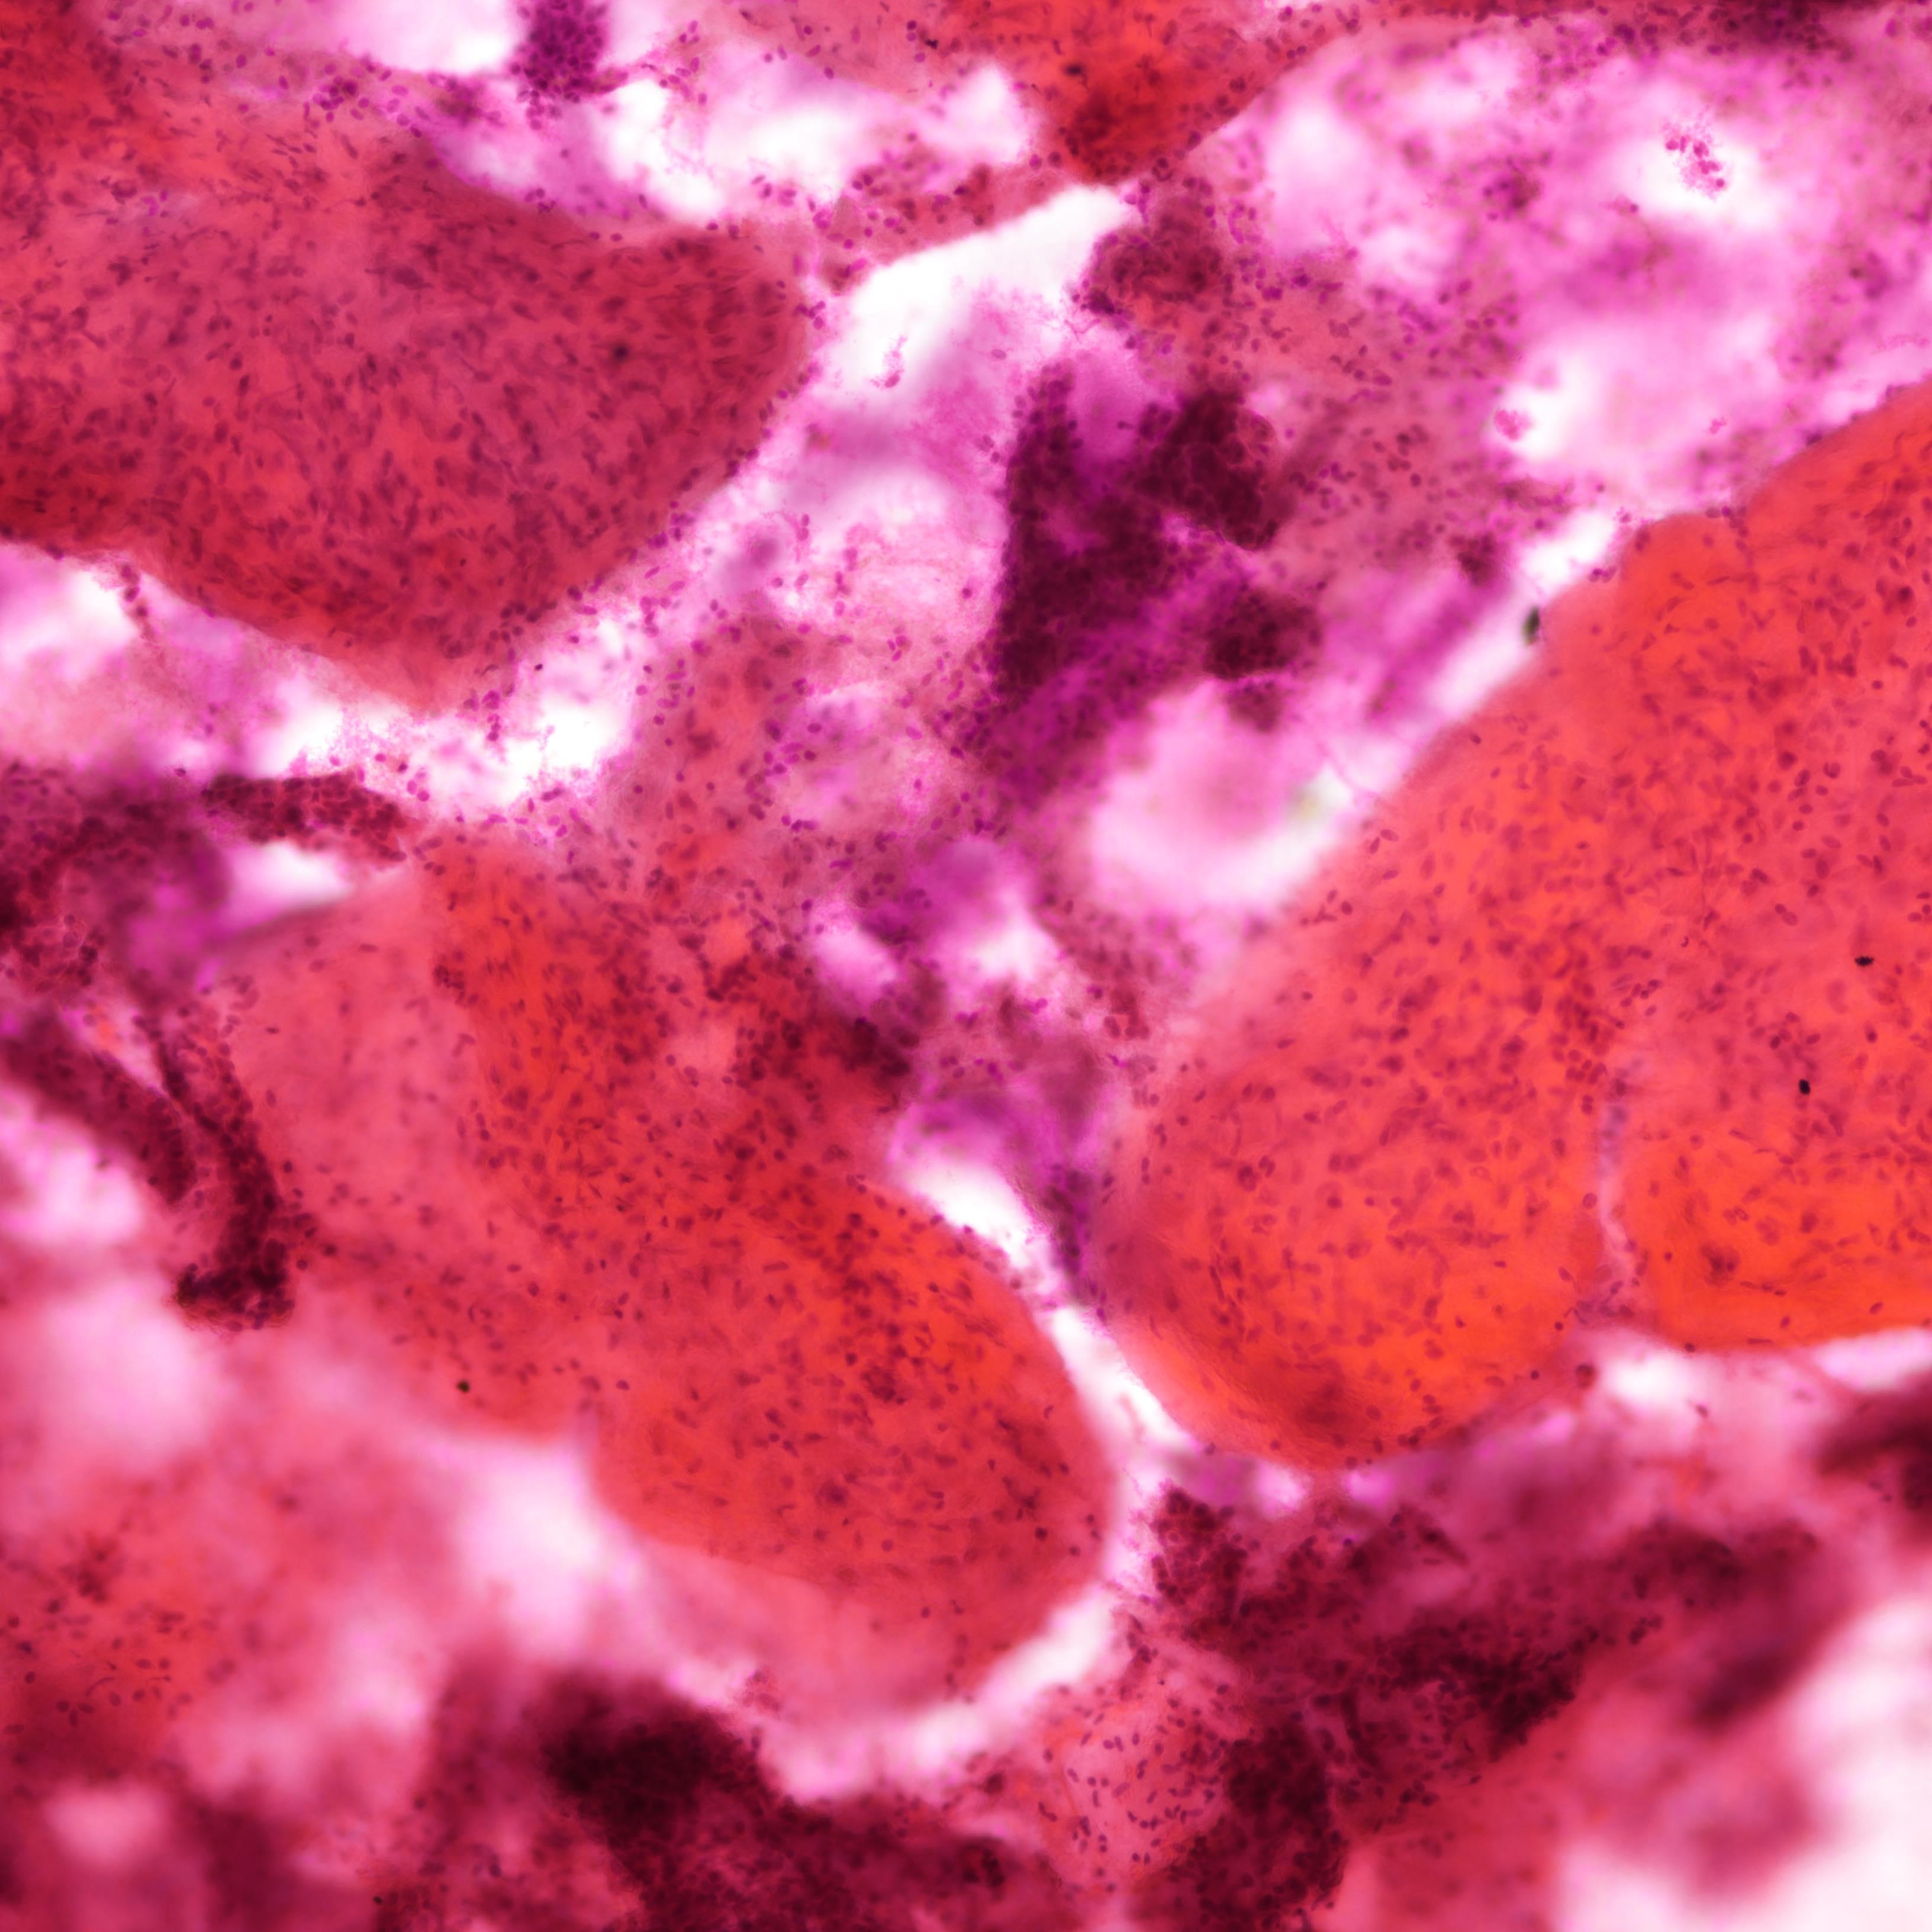 Fibromyxoid stromal clumps